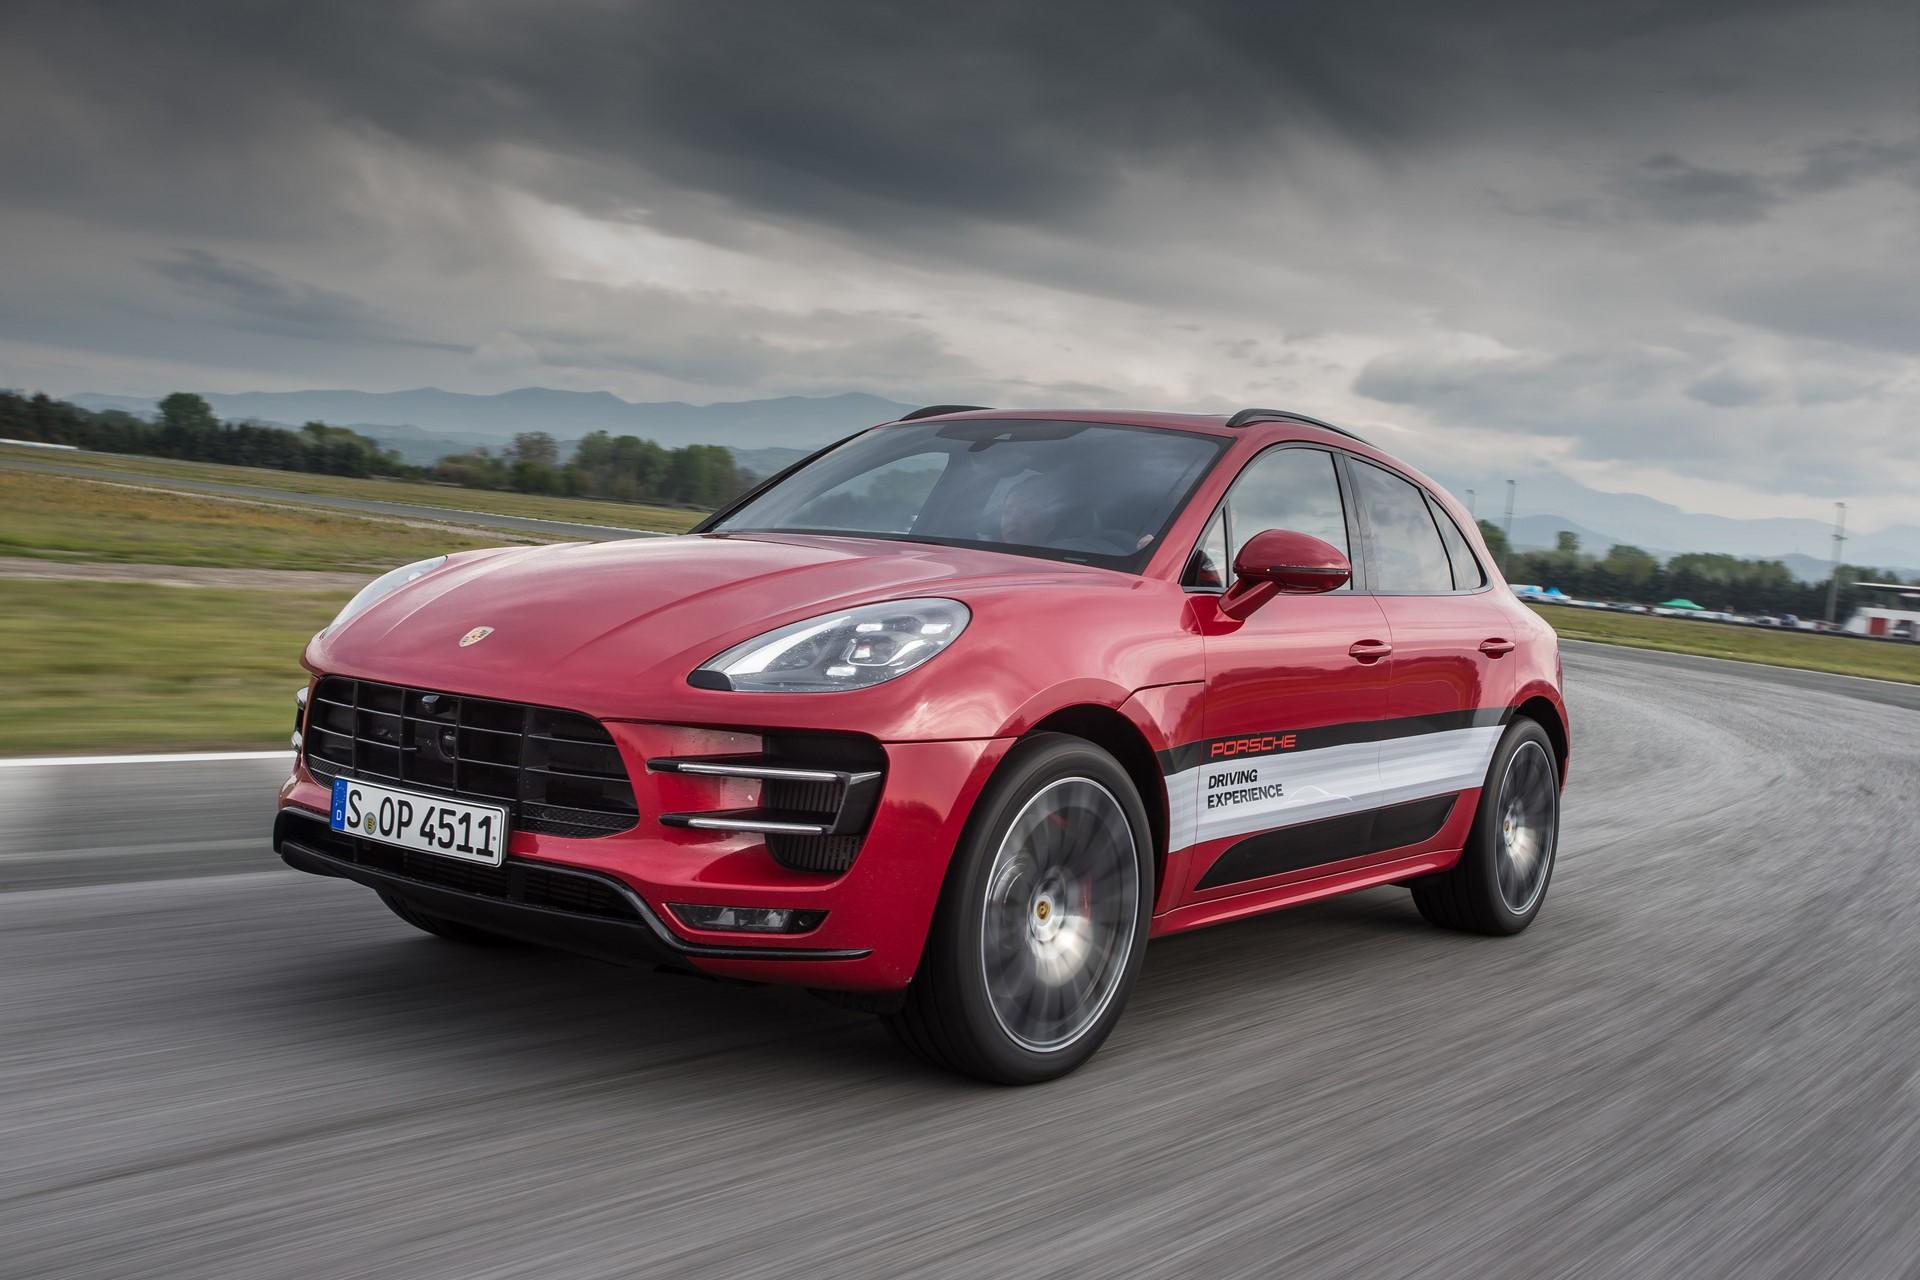 Porsche Driving Experience 2017 Serres (60)